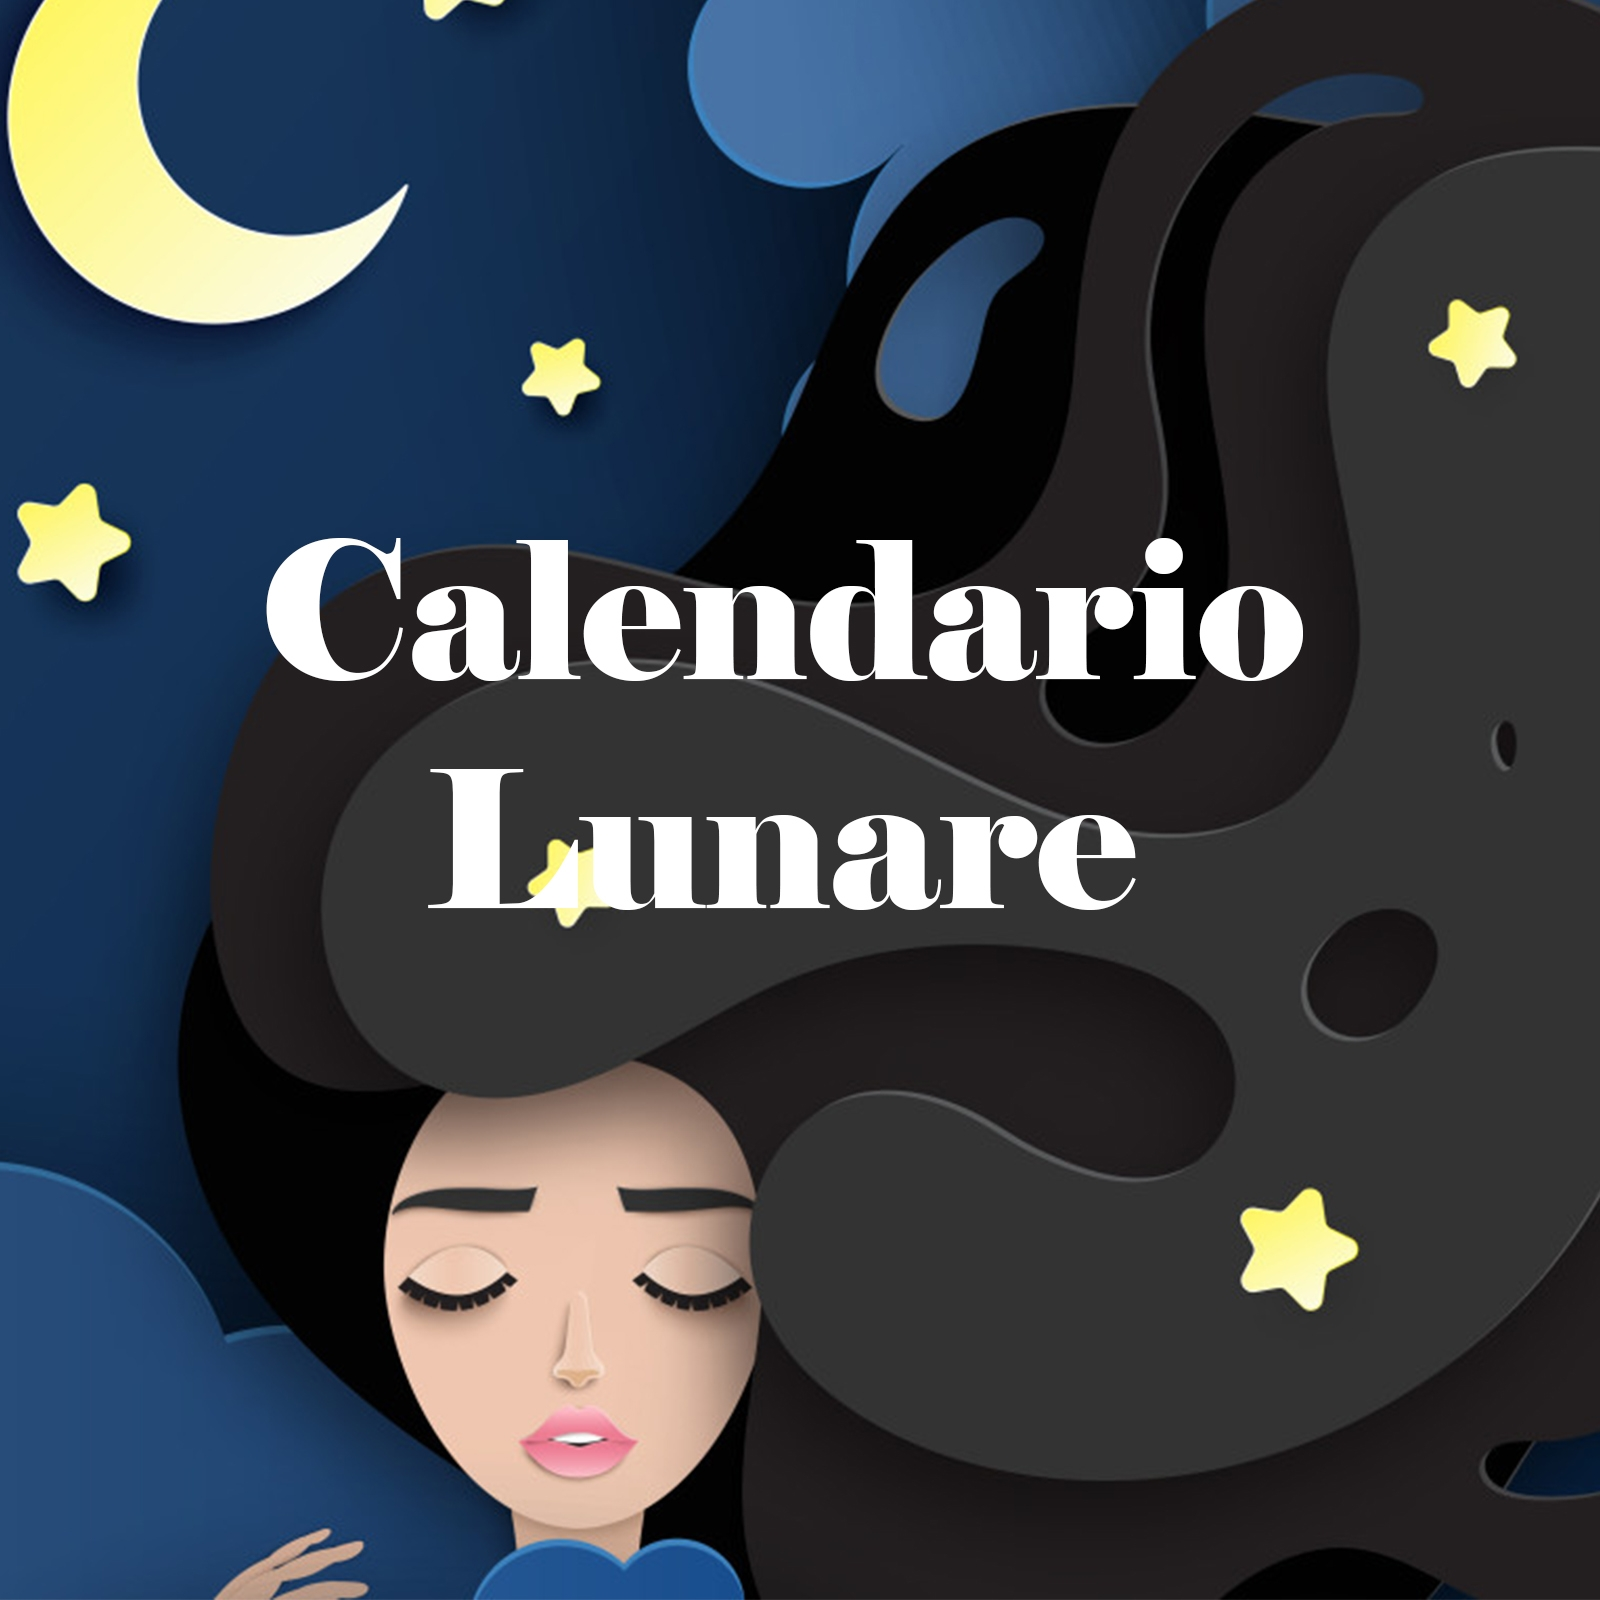 Calendario Lunare Salute E Bellezza.Calendario Lunare Official Progetto Rapunzel Italia